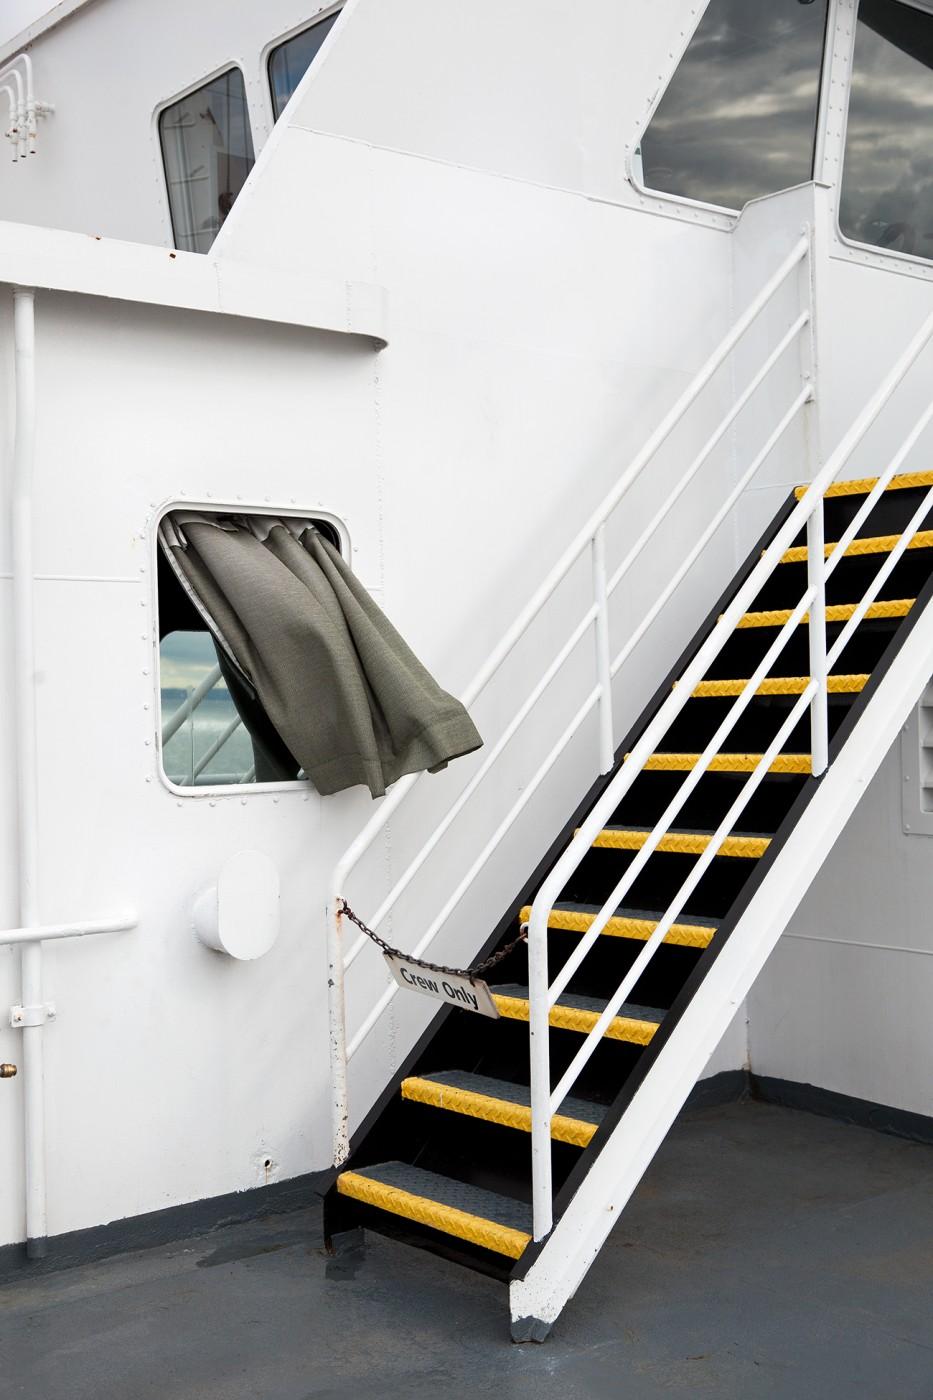 Lindsay Lauckner Gundlock, </span><span><em>Wind on the Ferry, Digital C-Print</em>, </span><span>2015